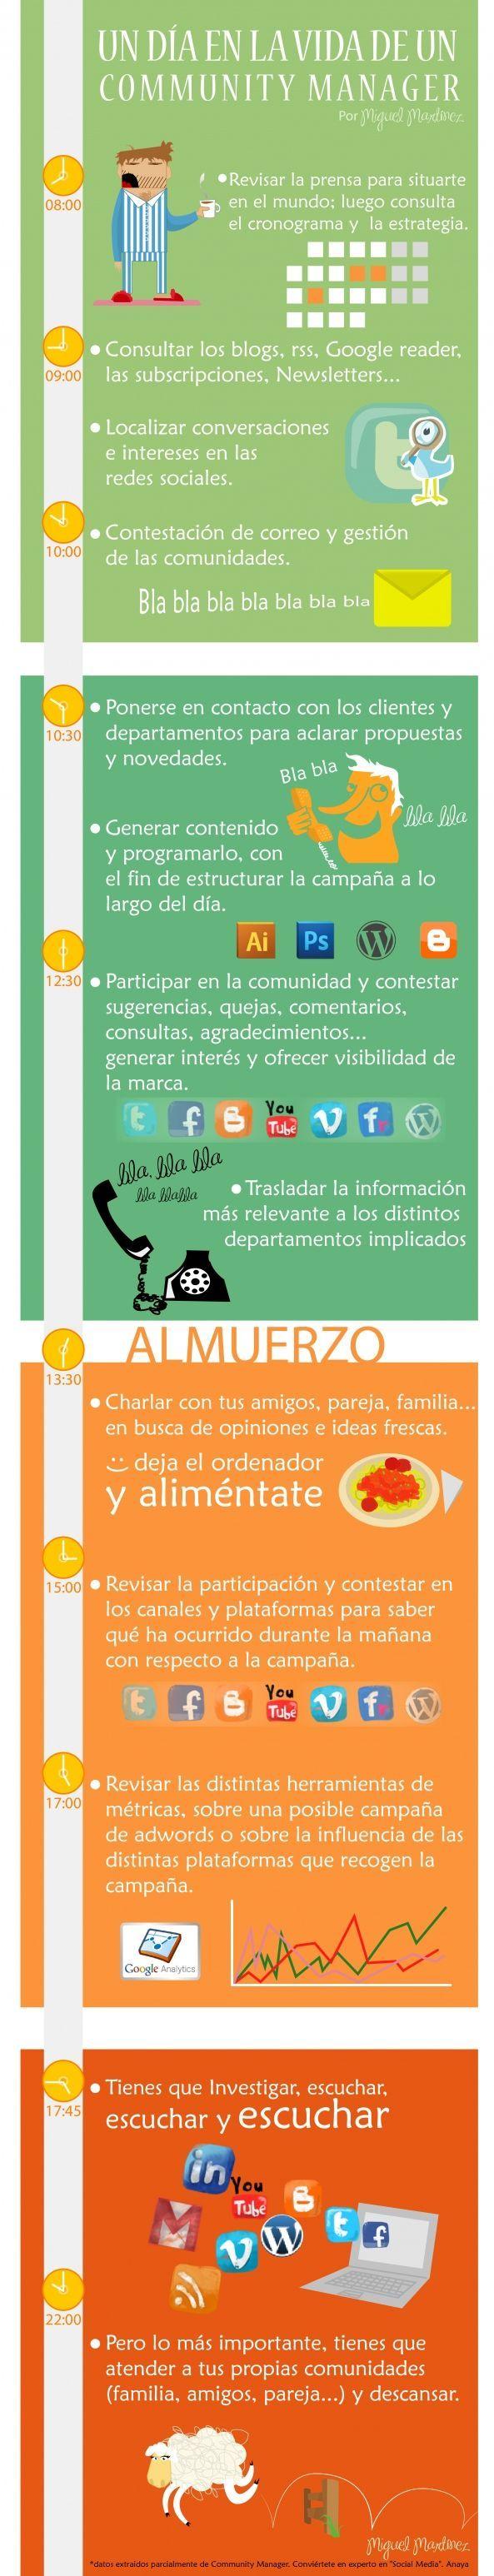 Interesante infografía sobre la labor del #CommunityManager. #SocialMedia